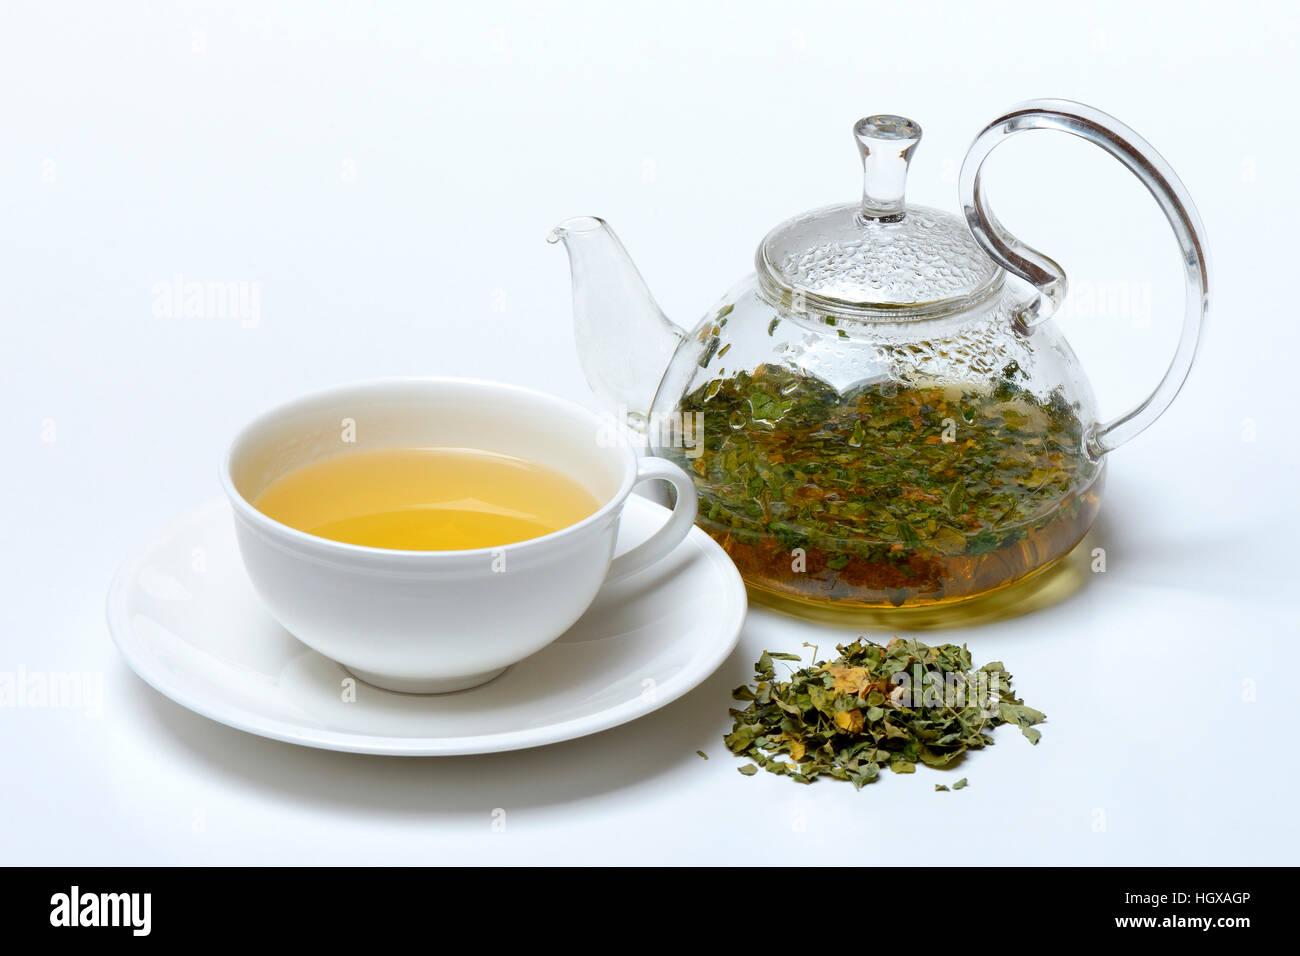 Moringa-Tee in Tasse und Teekanne und Moringablaetter, Moringatee Stock Photo